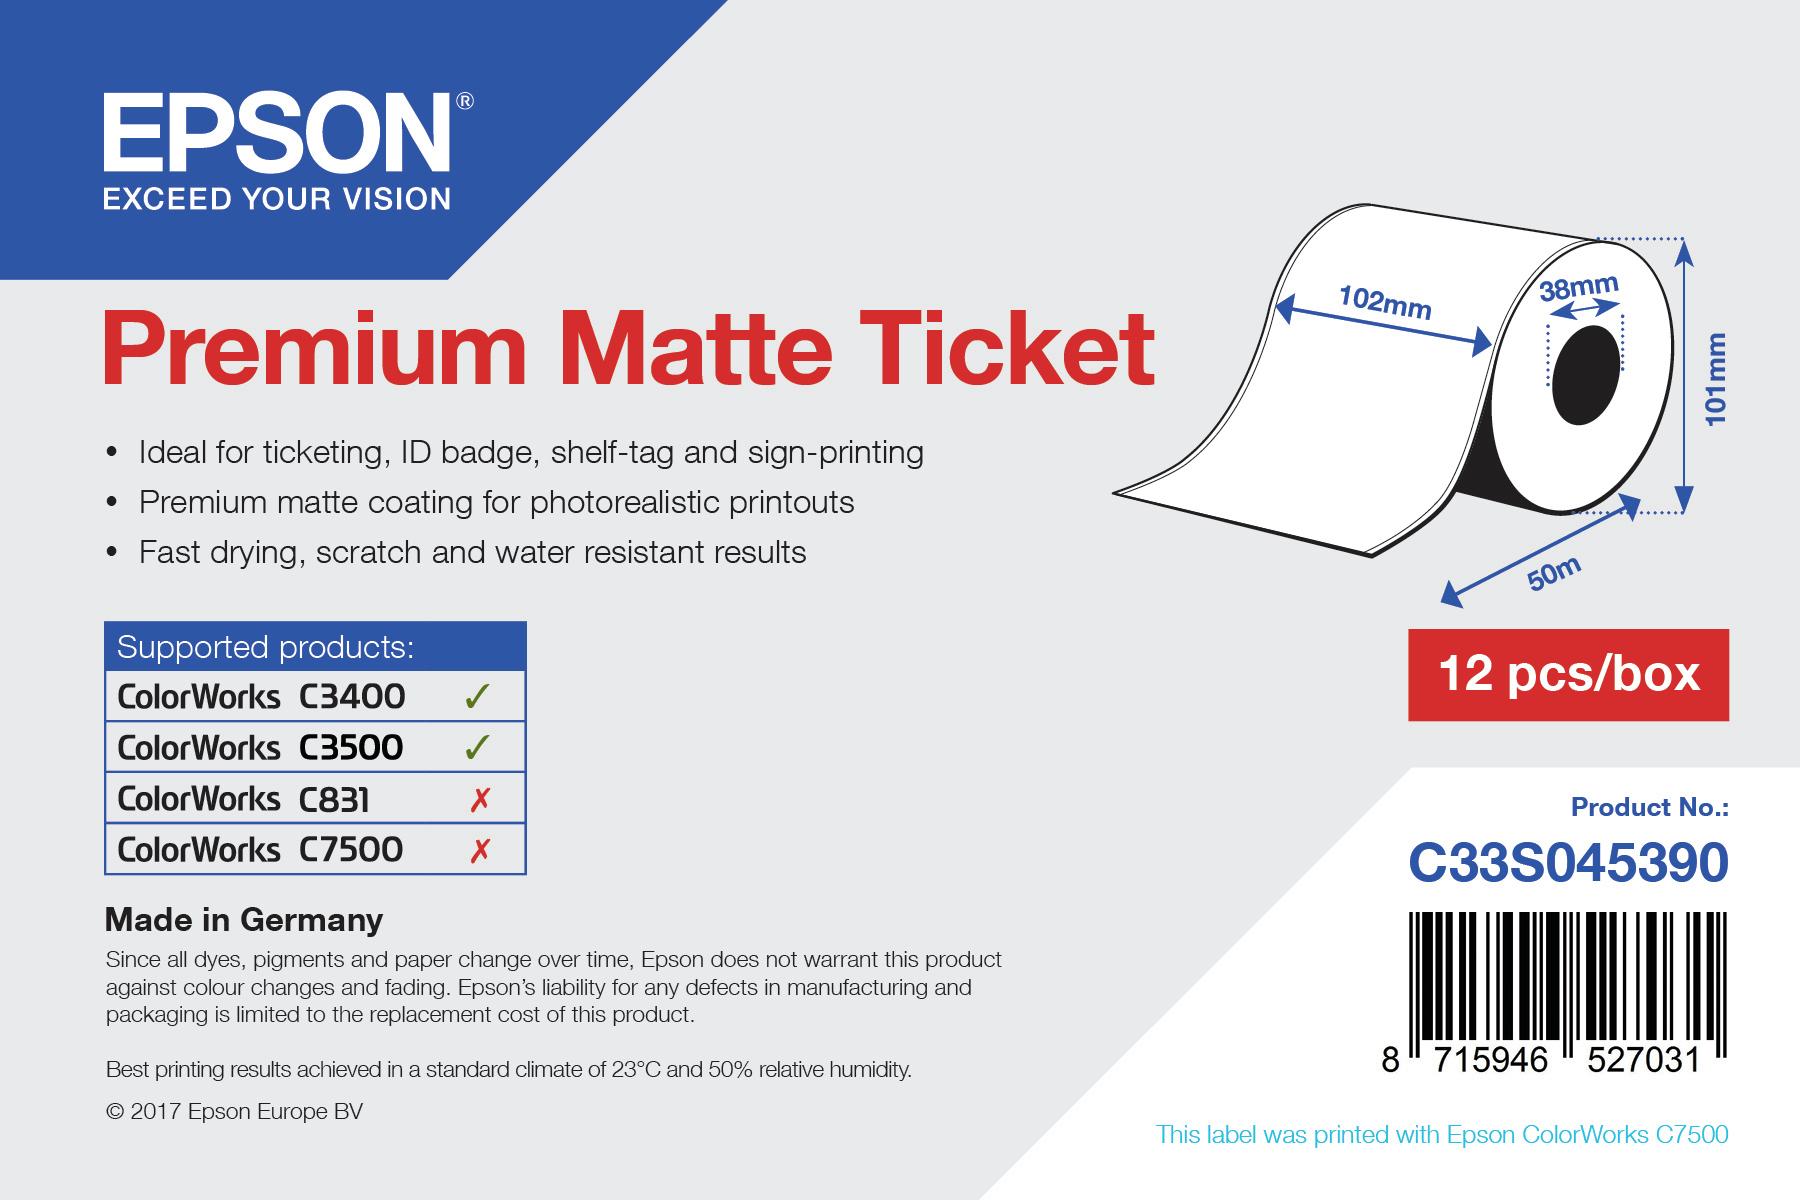 Epson Beleg- / Couponrolle (endlos), Normalpapier, 102mm, C33S045390